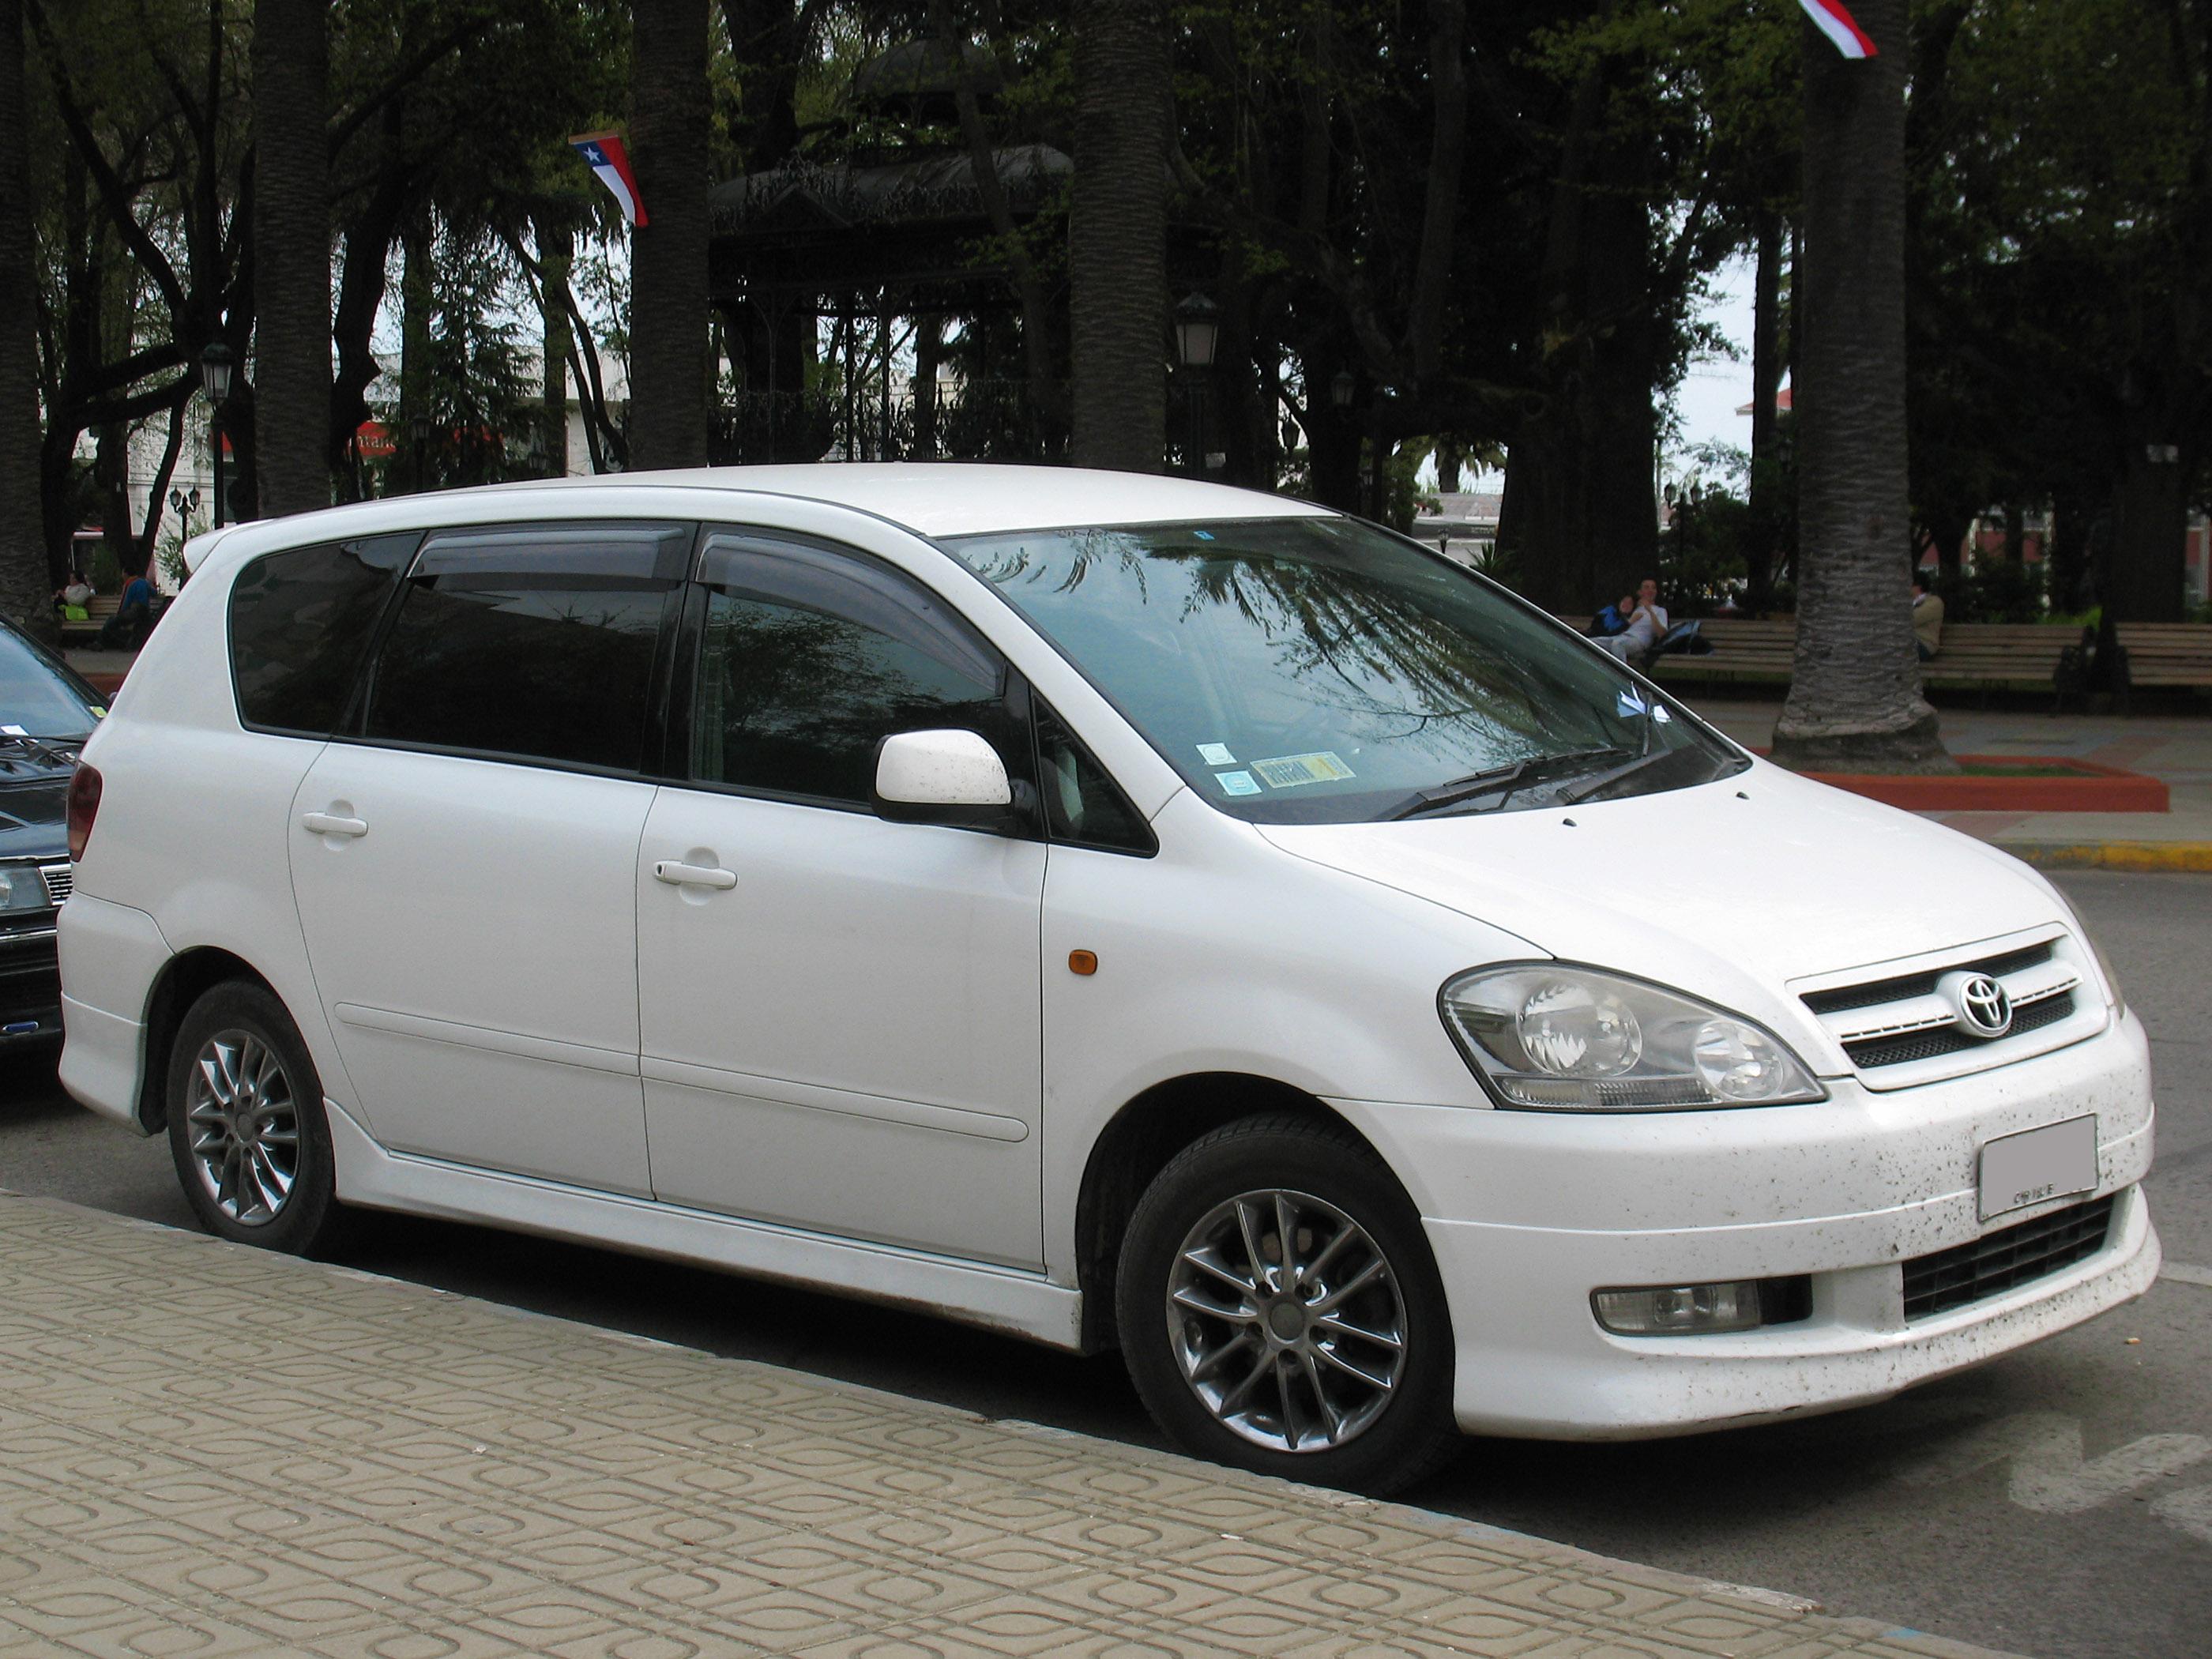 File:Toyota Ipsum 240i 2001 (15279920111).jpg